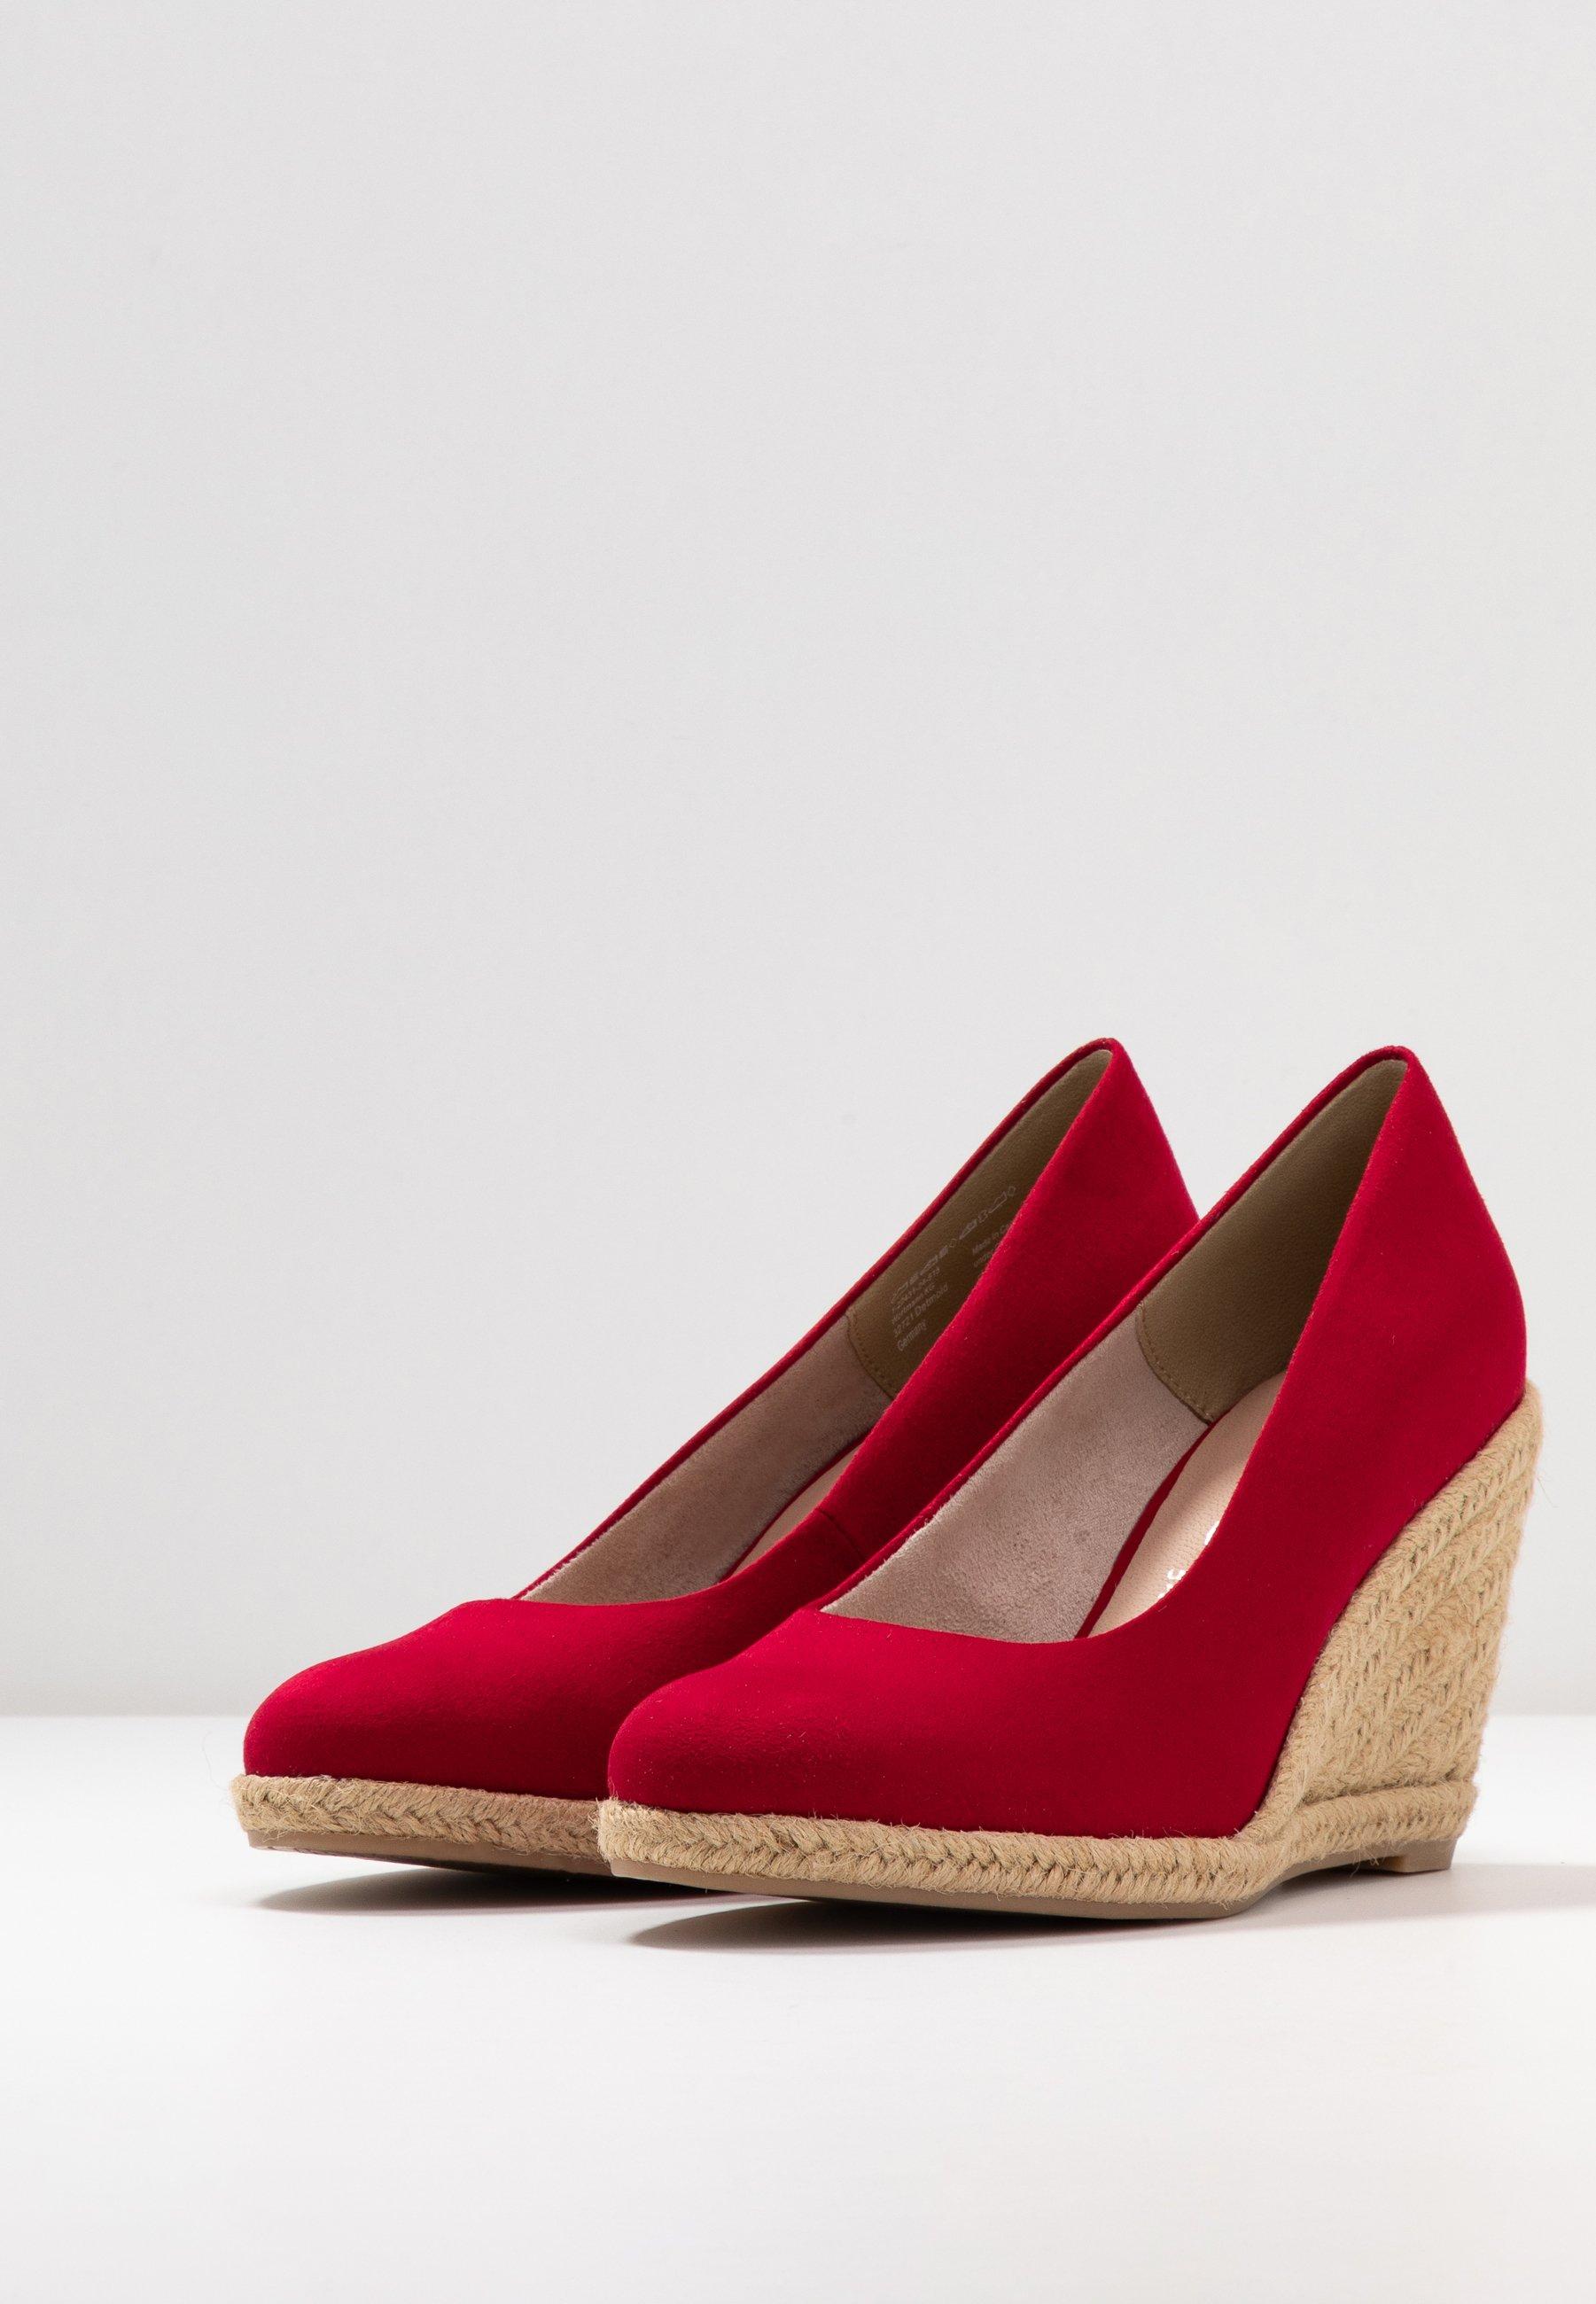 Tamaris COURT SHOE - High Heel Pumps - lipstick hVAXLd